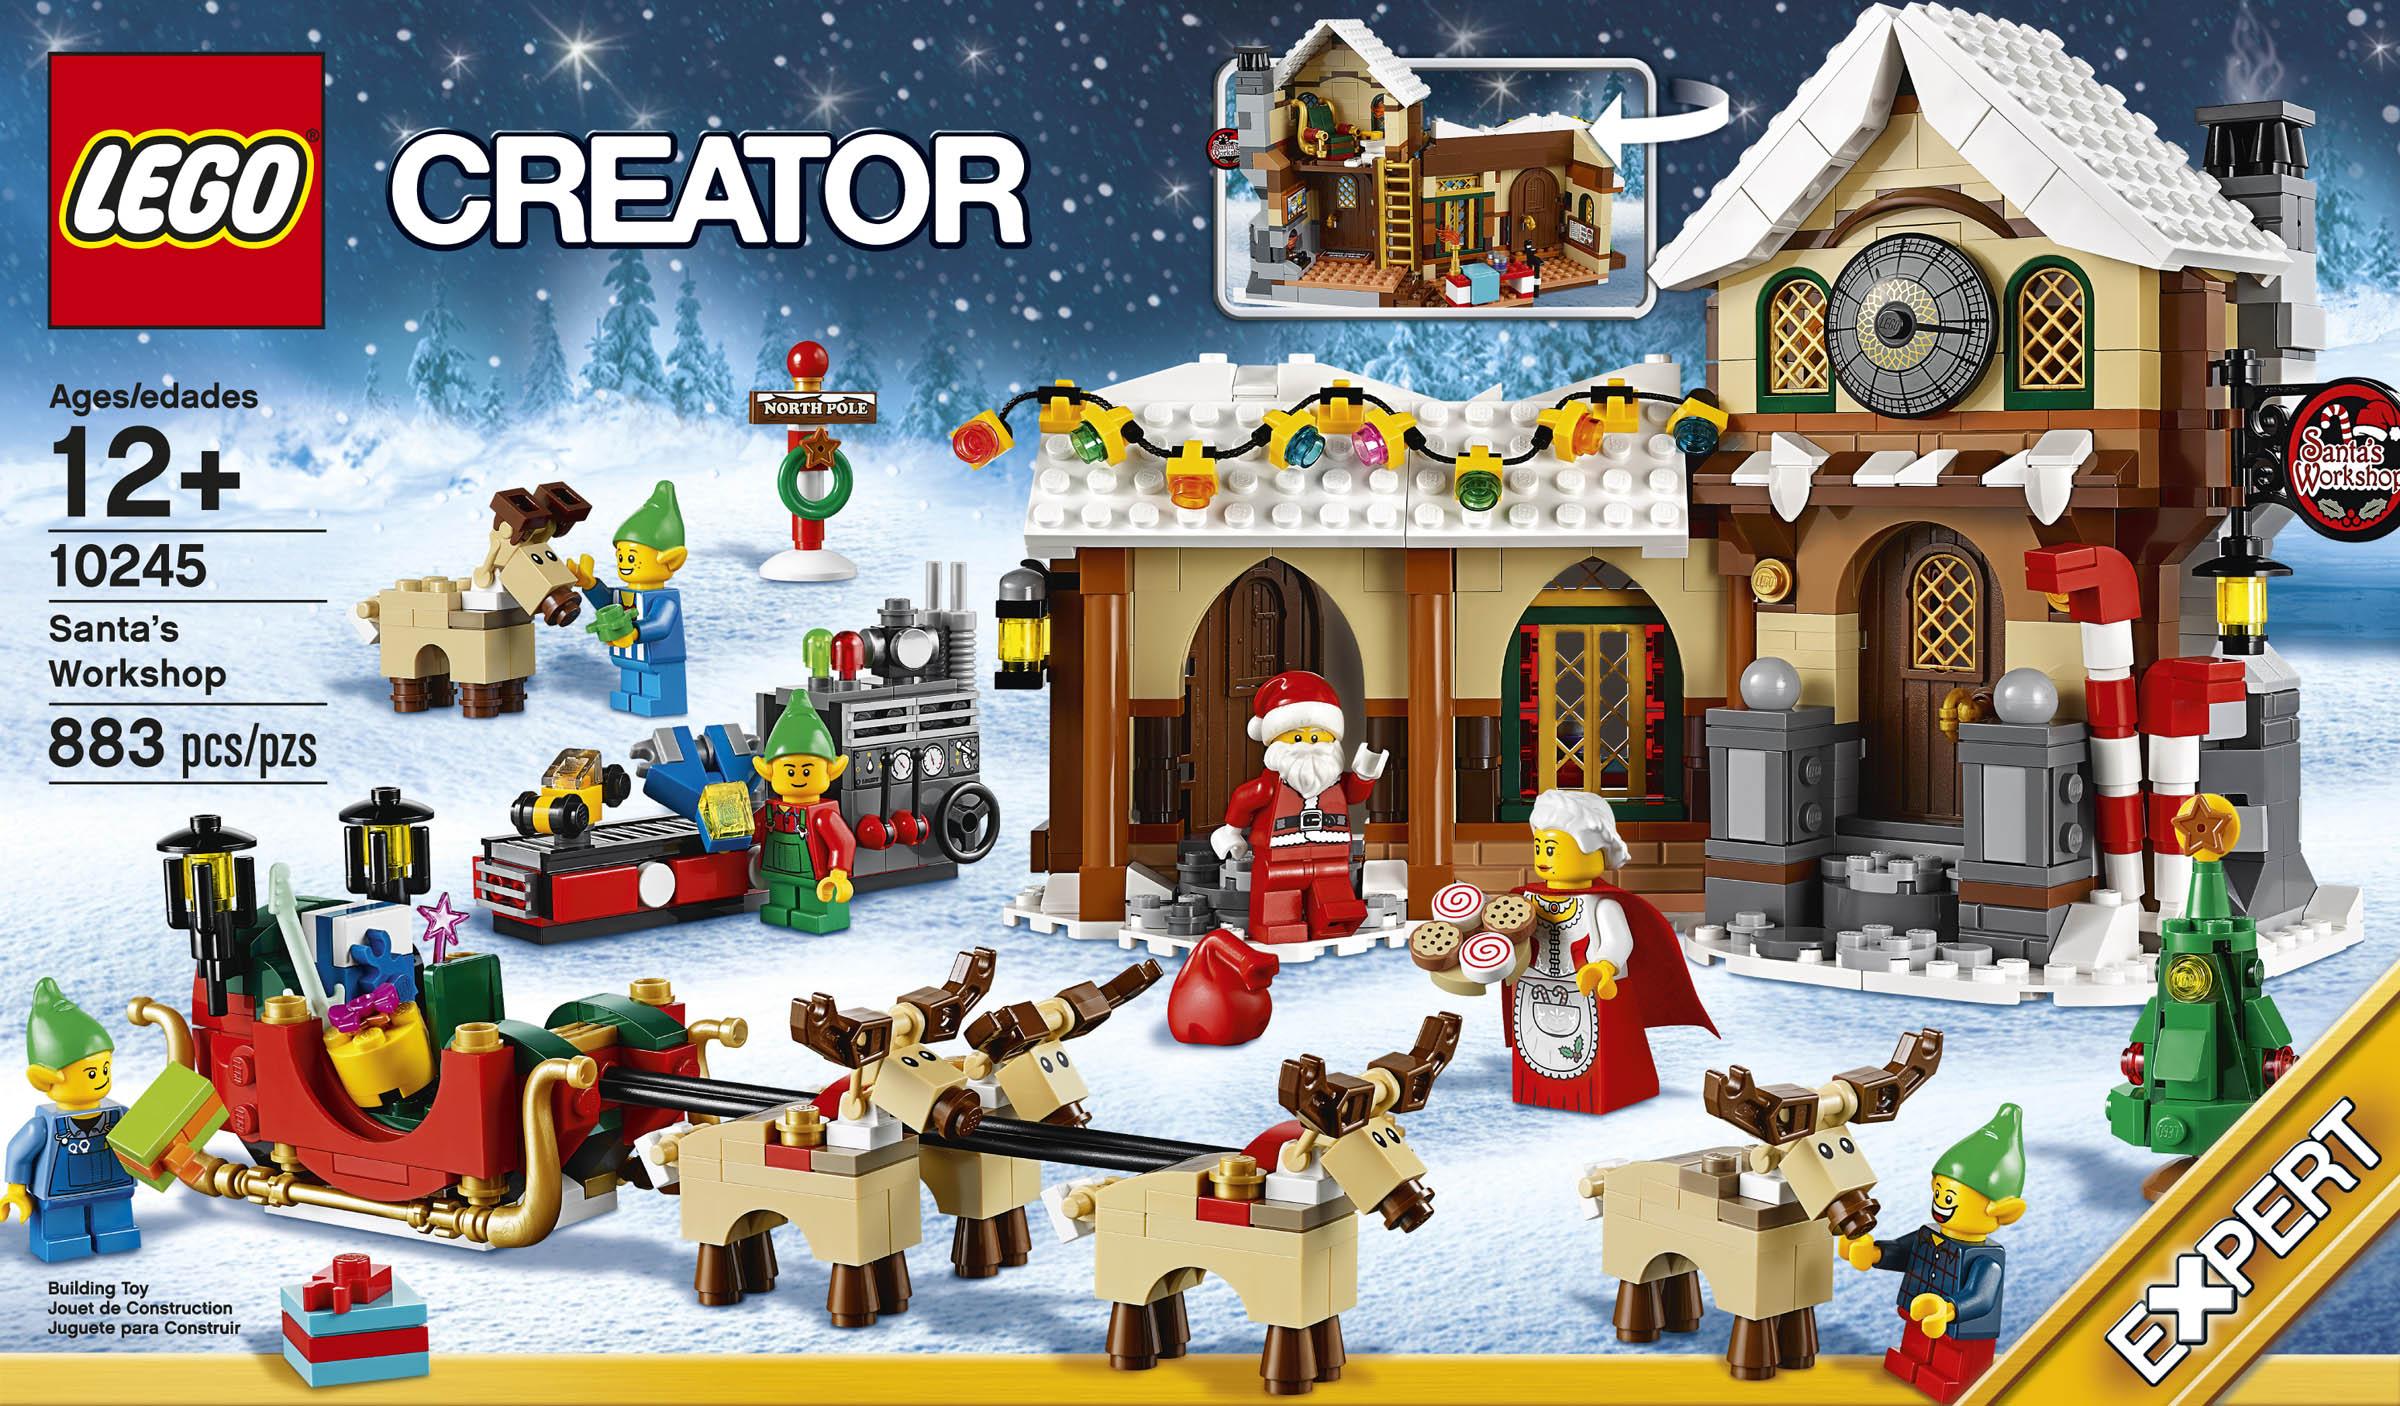 Review: LEGO Creator 10245 Santa's Workshop – Jay's Brick Blog